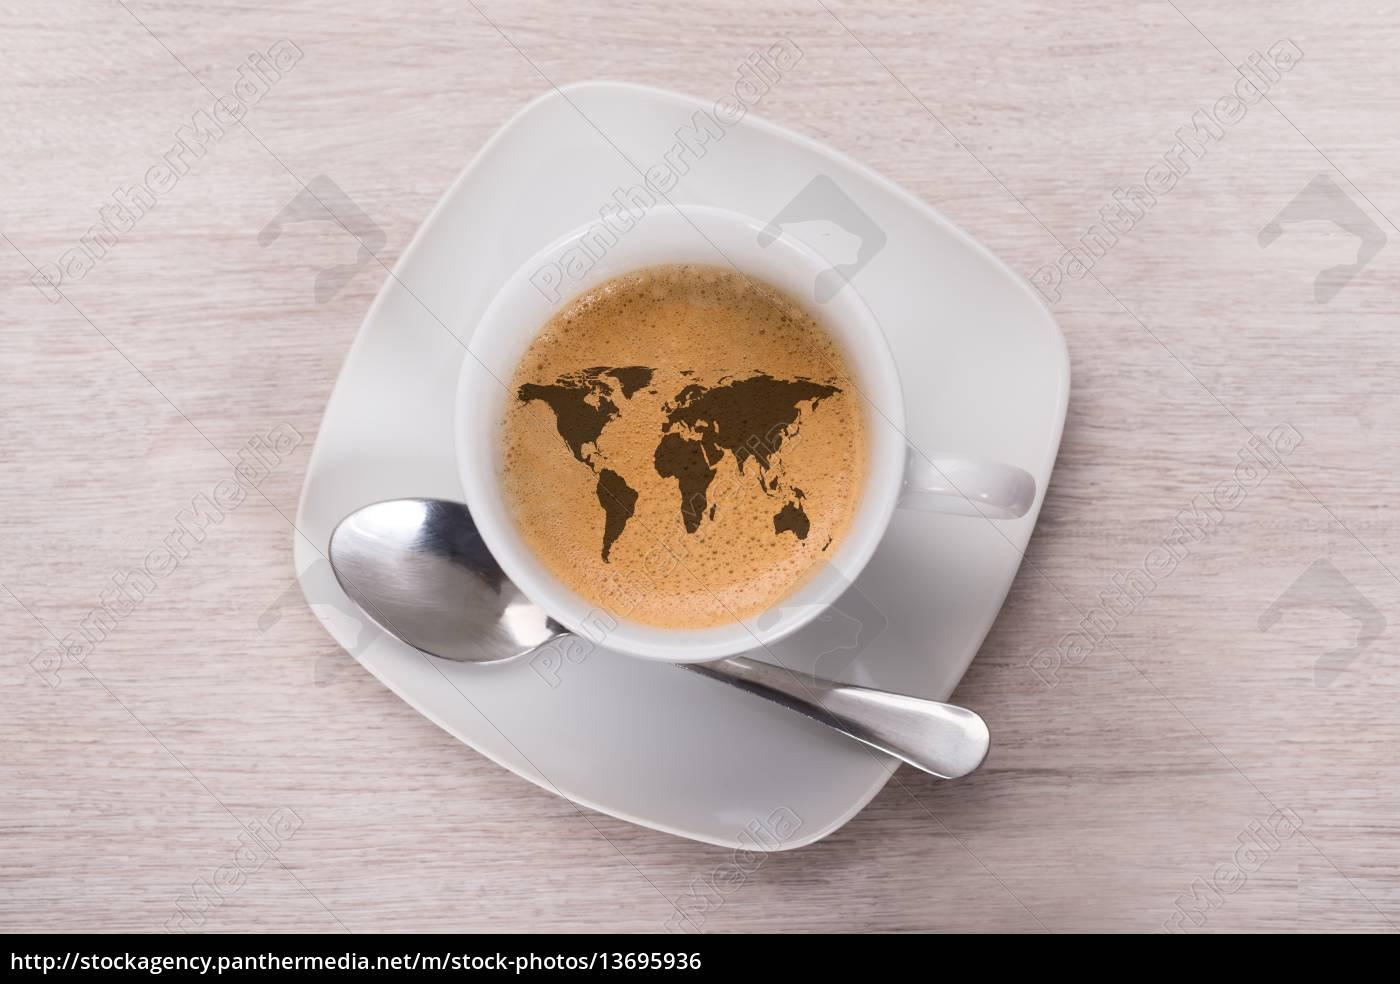 café, de, mapa, del, mundo - 13695936